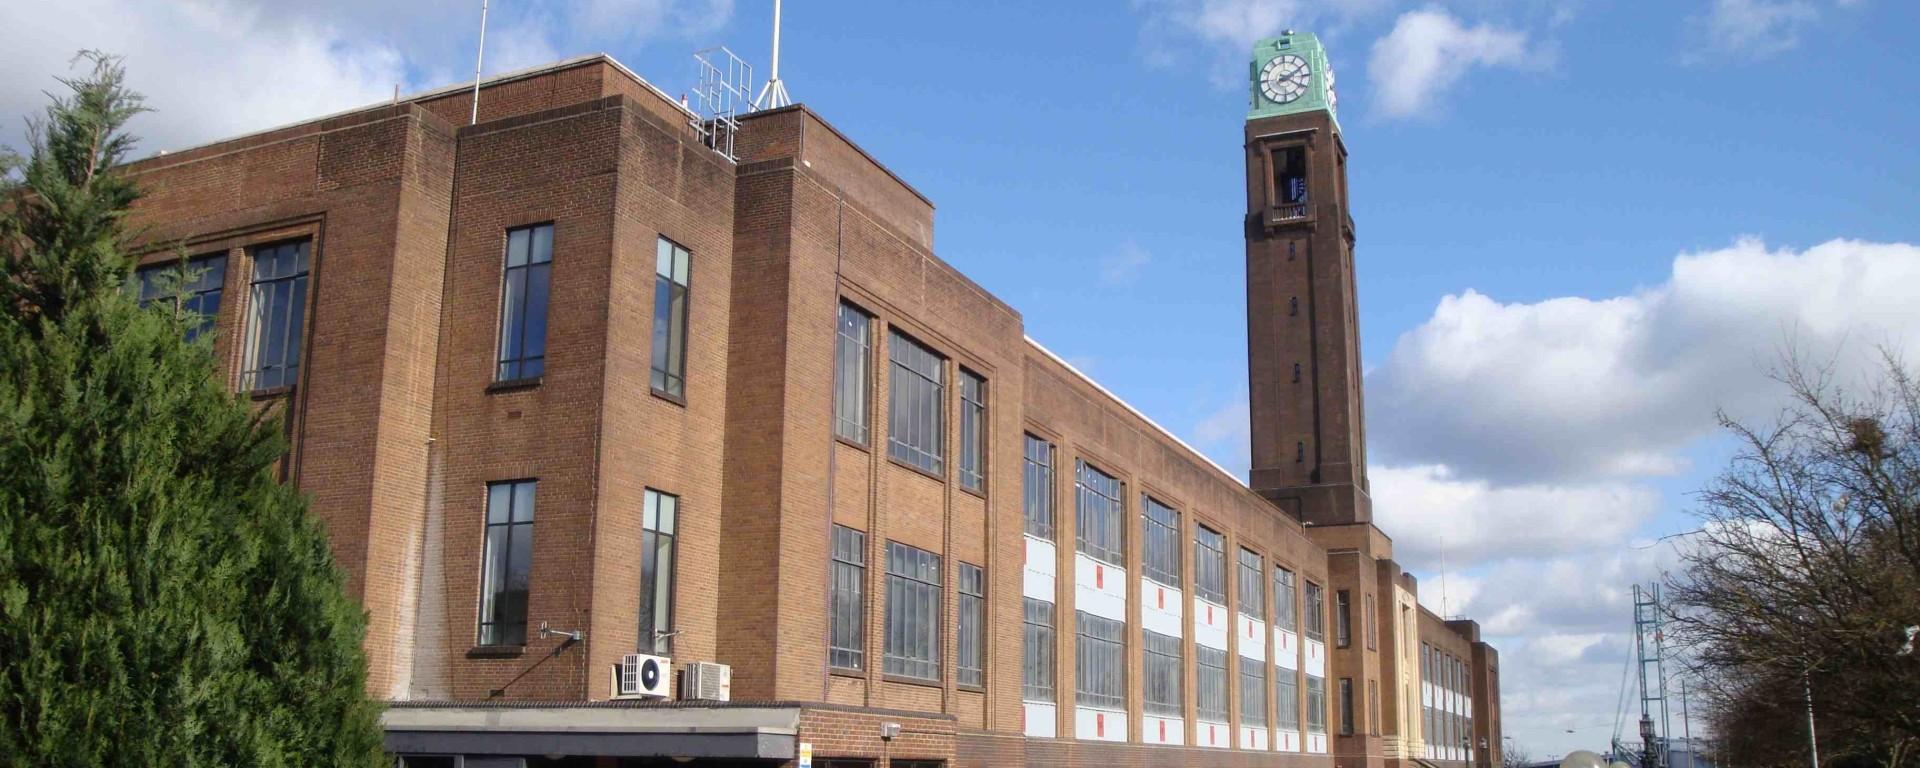 Gillette Factory